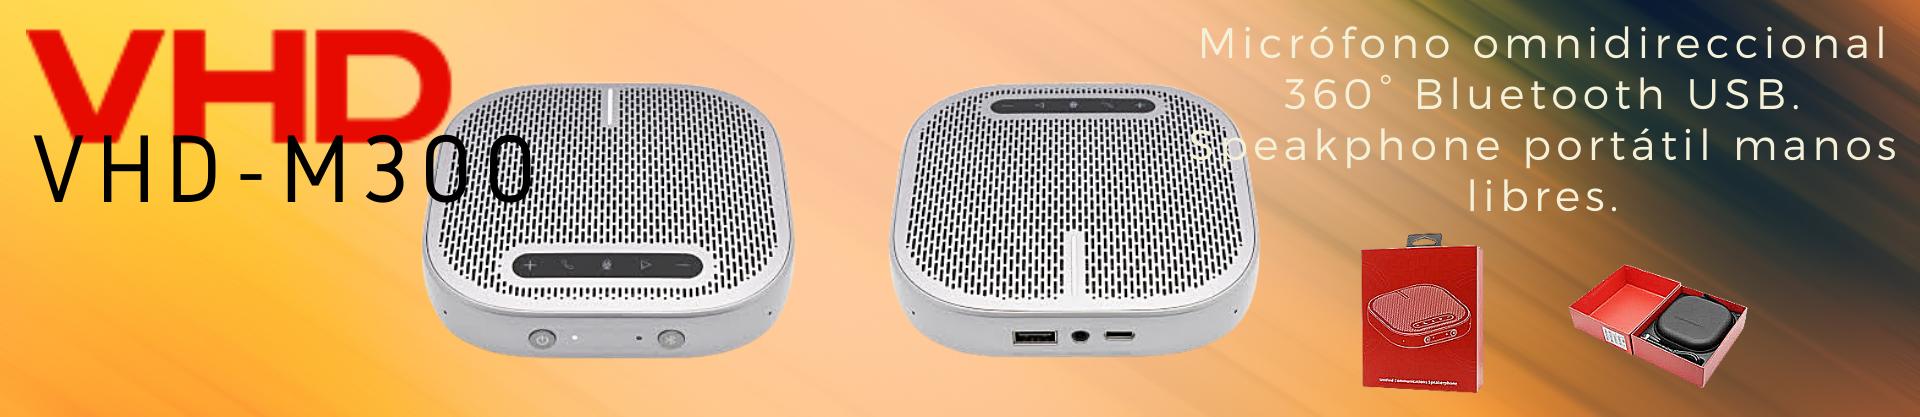 microfono-speakerphone-VHD-M300